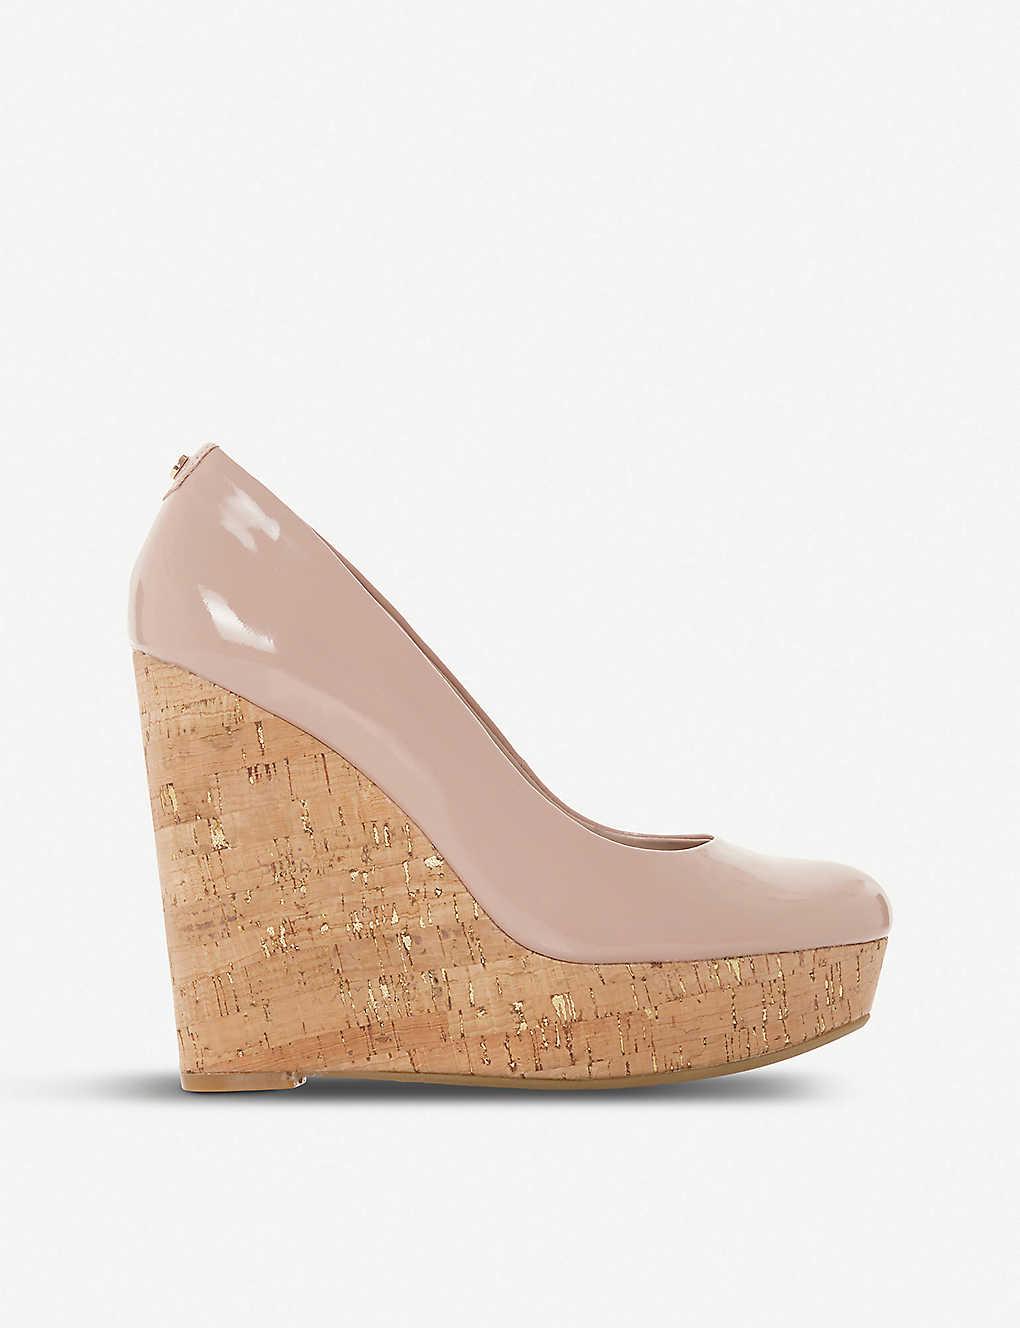 edfe168ce5af9 Alycea - suede wedge sandal - Blushpatent synthetic ...